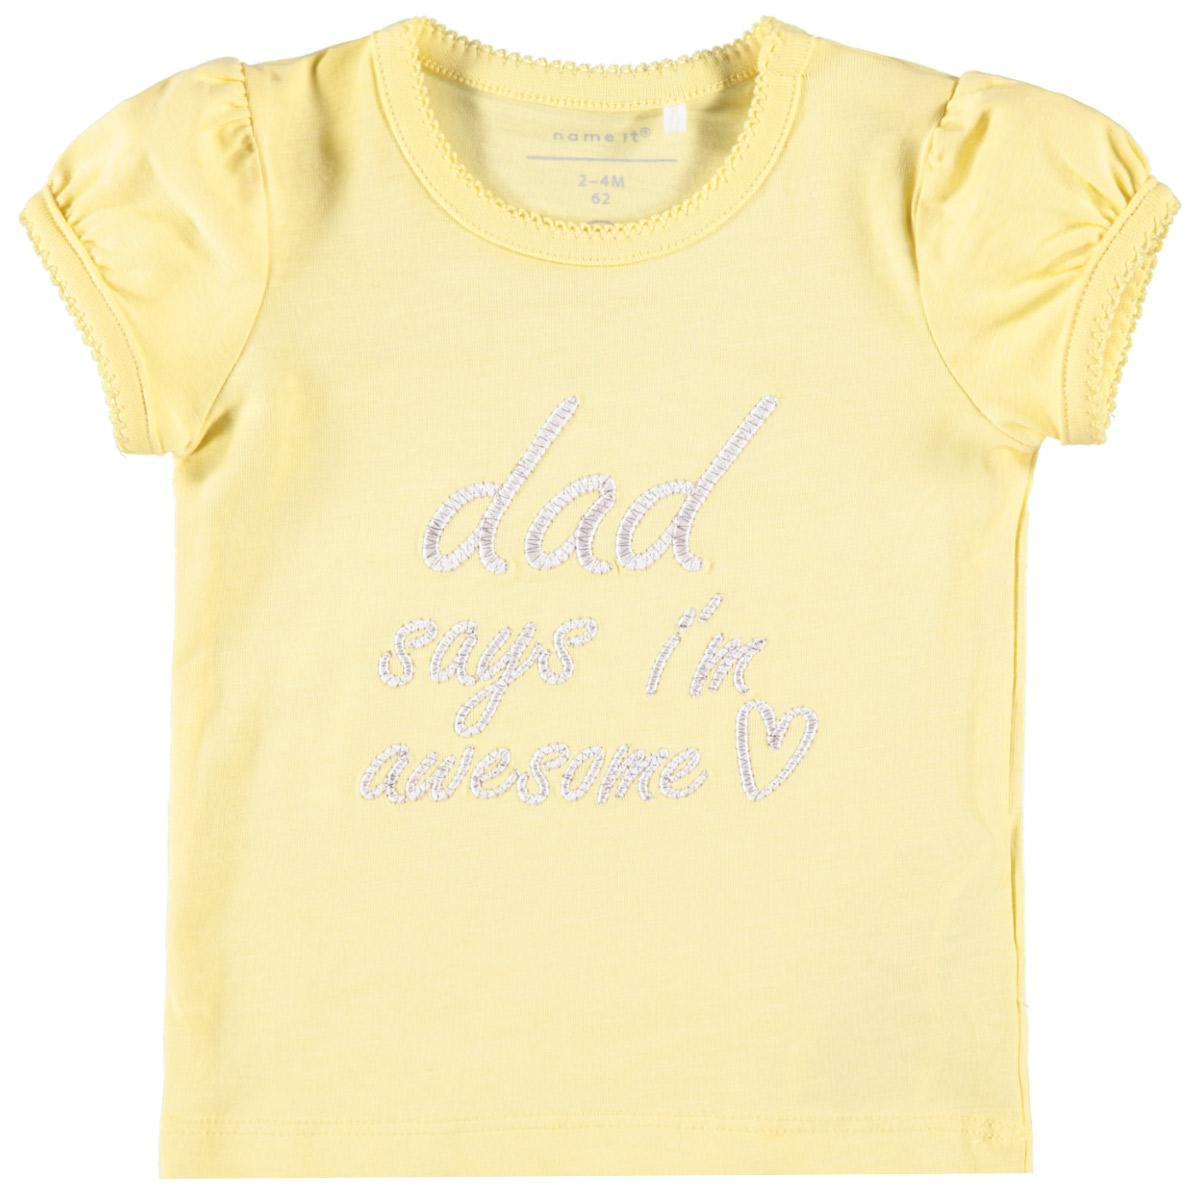 Babykleding Geen Verzendkosten.Babykleding Online Bestellen